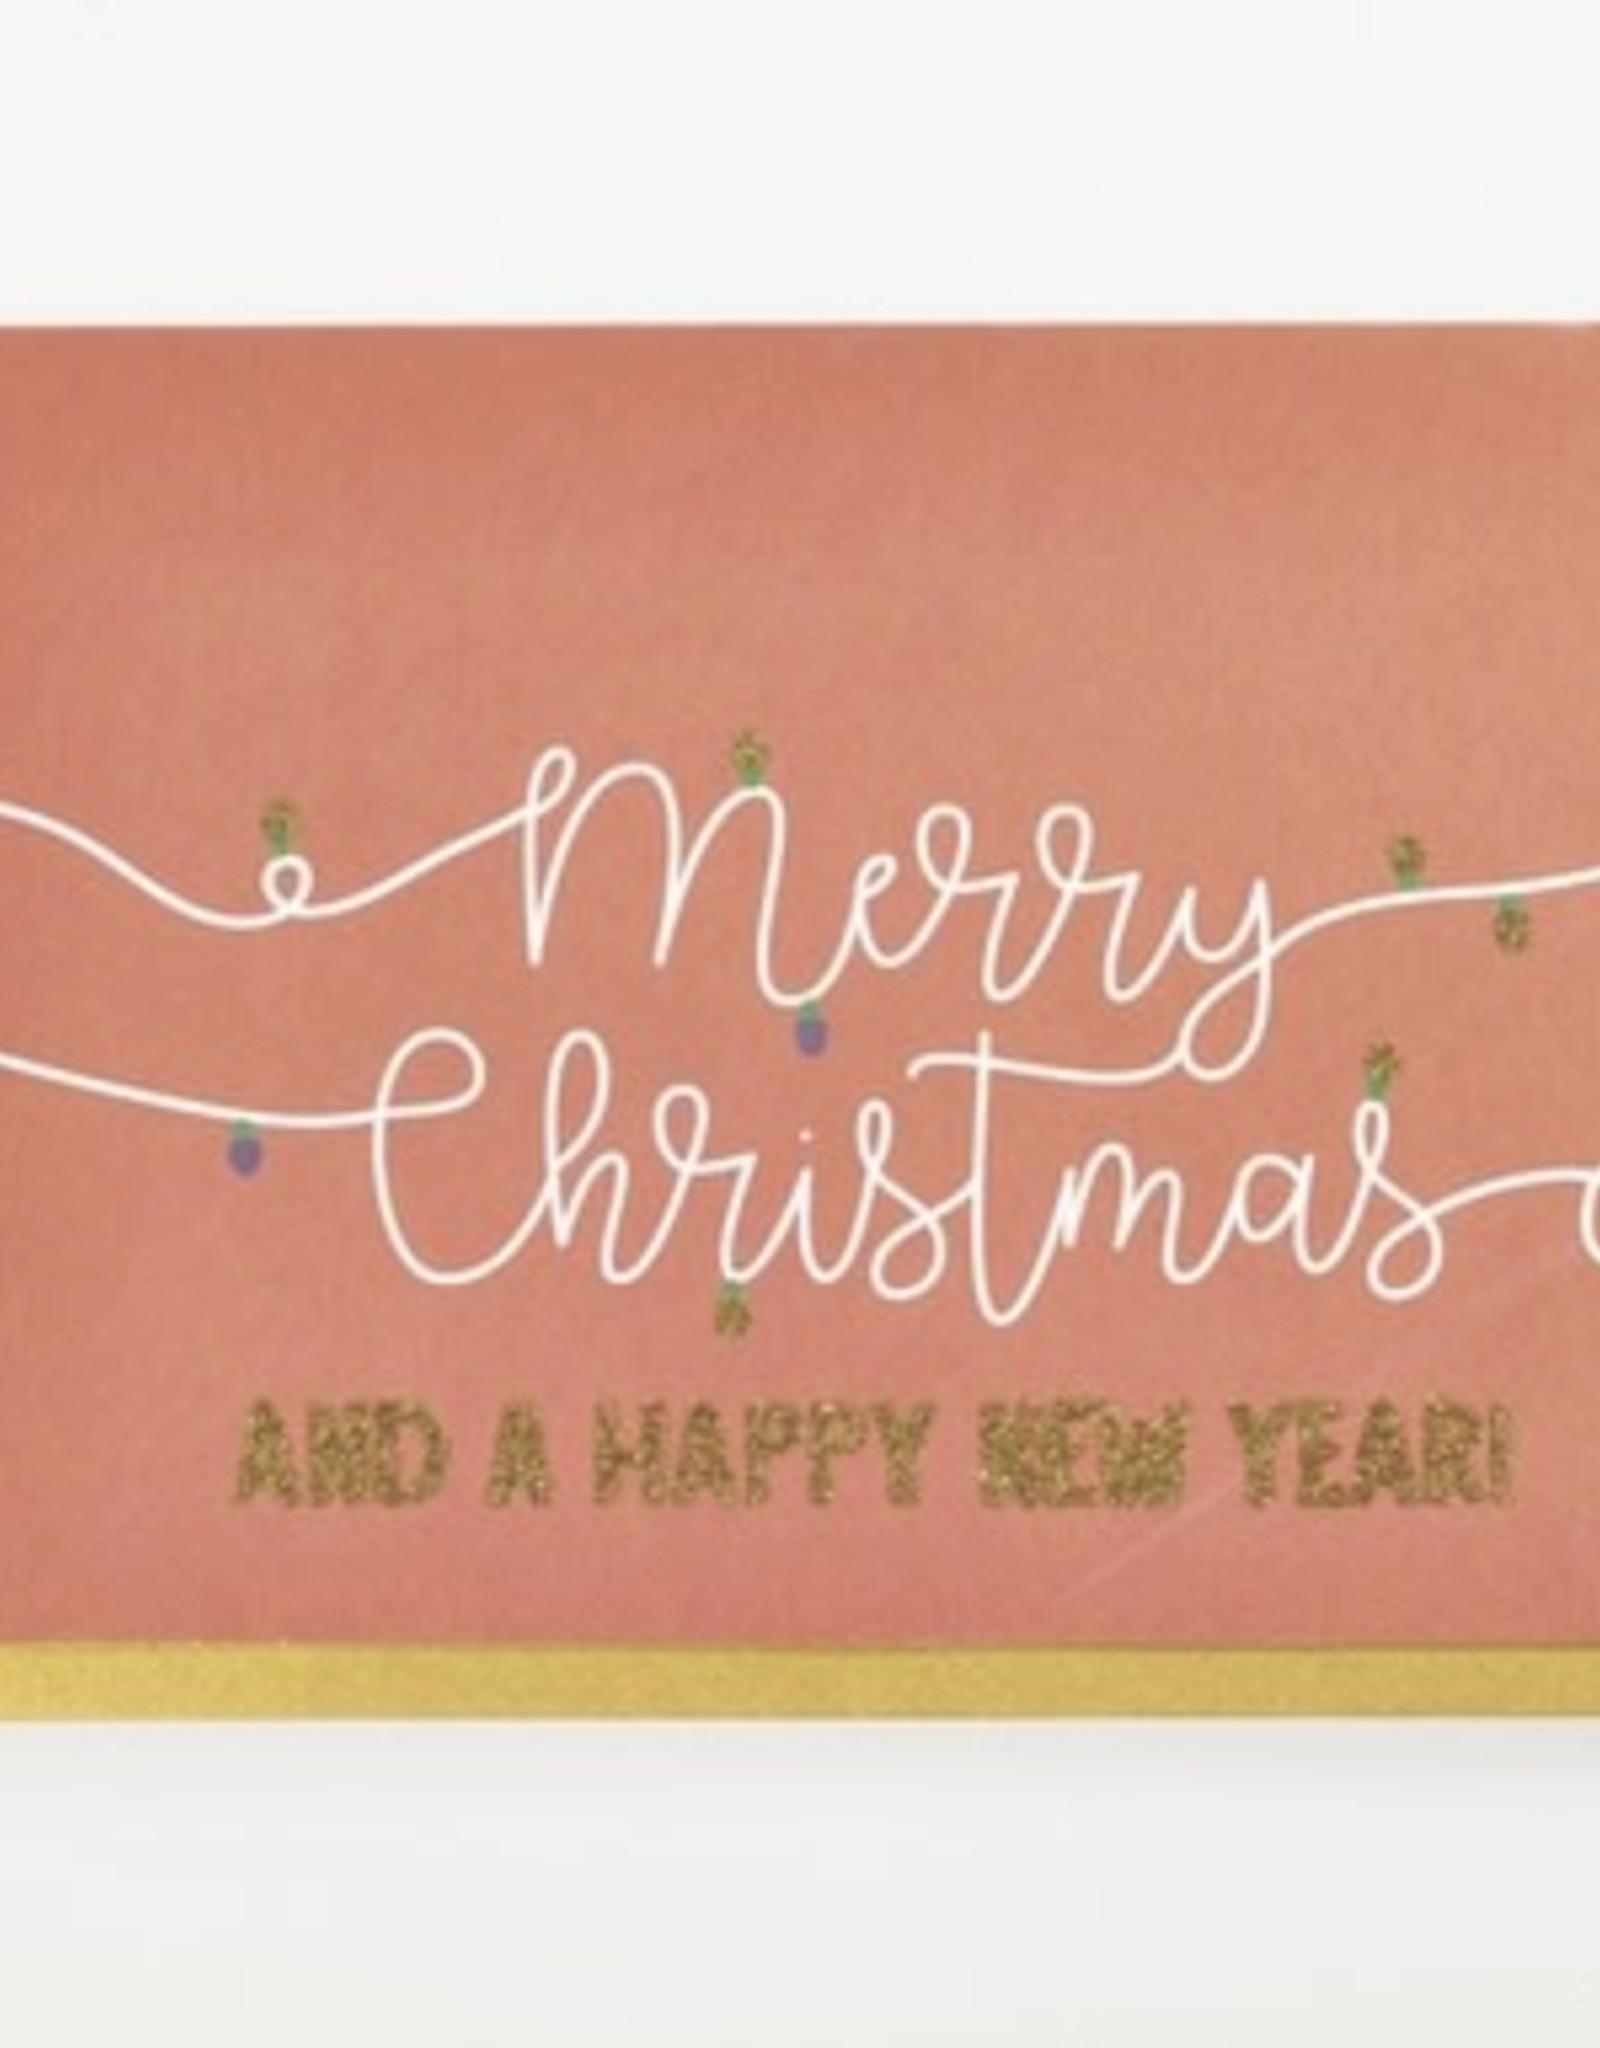 Enfant Terrible Dubbele wenskaart Enfant terrible: Merry christmas and a happy new year